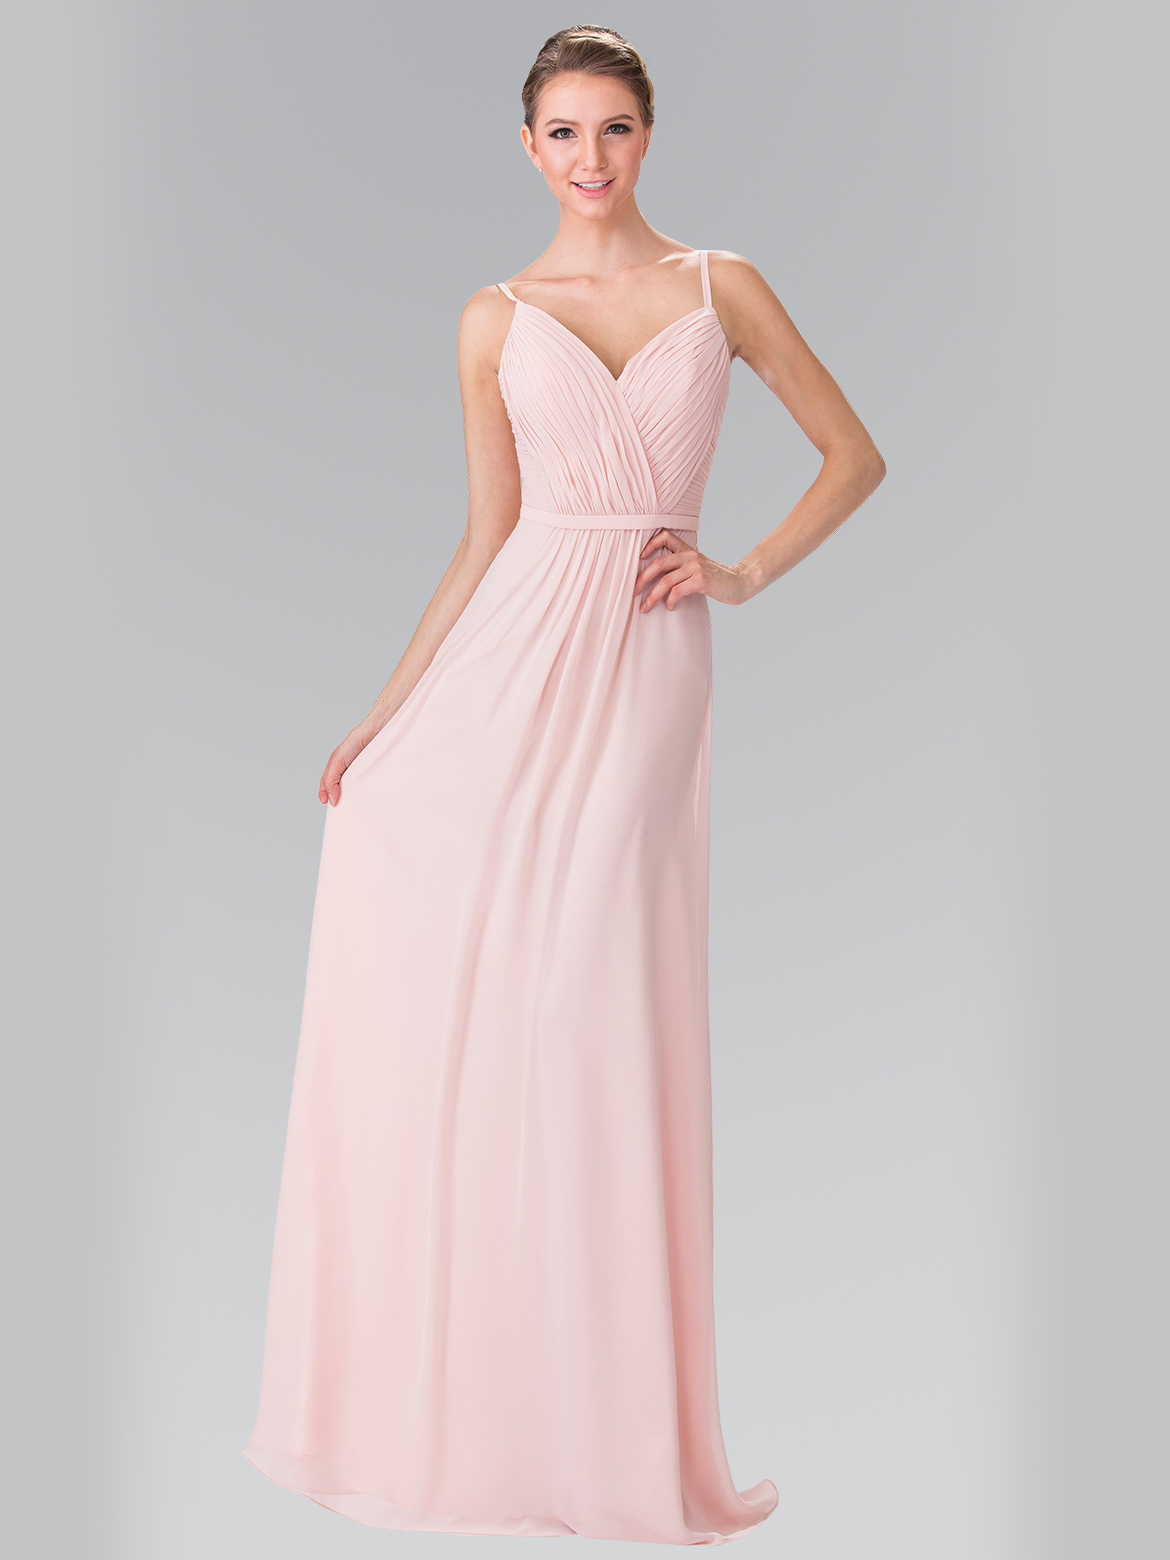 50 2374 Chiffon Bridesmaid Dress With Spaghetti Straps Blush Front View Medium